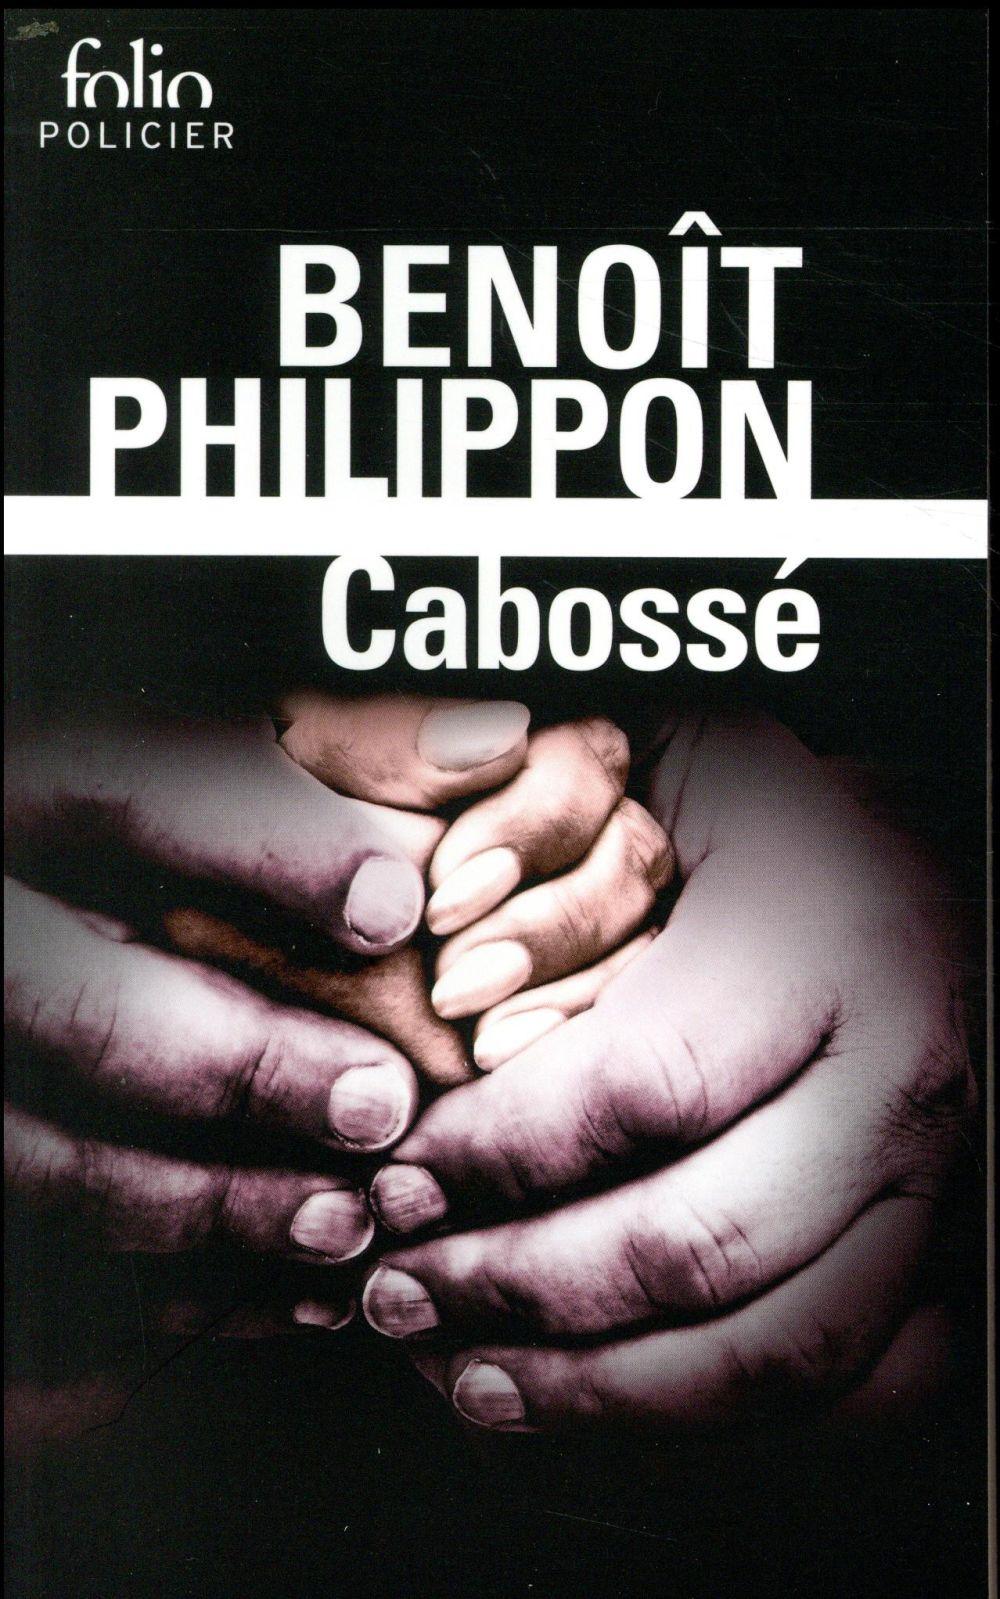 CABOSSE PHILIPPON BENOIT GALLIMARD